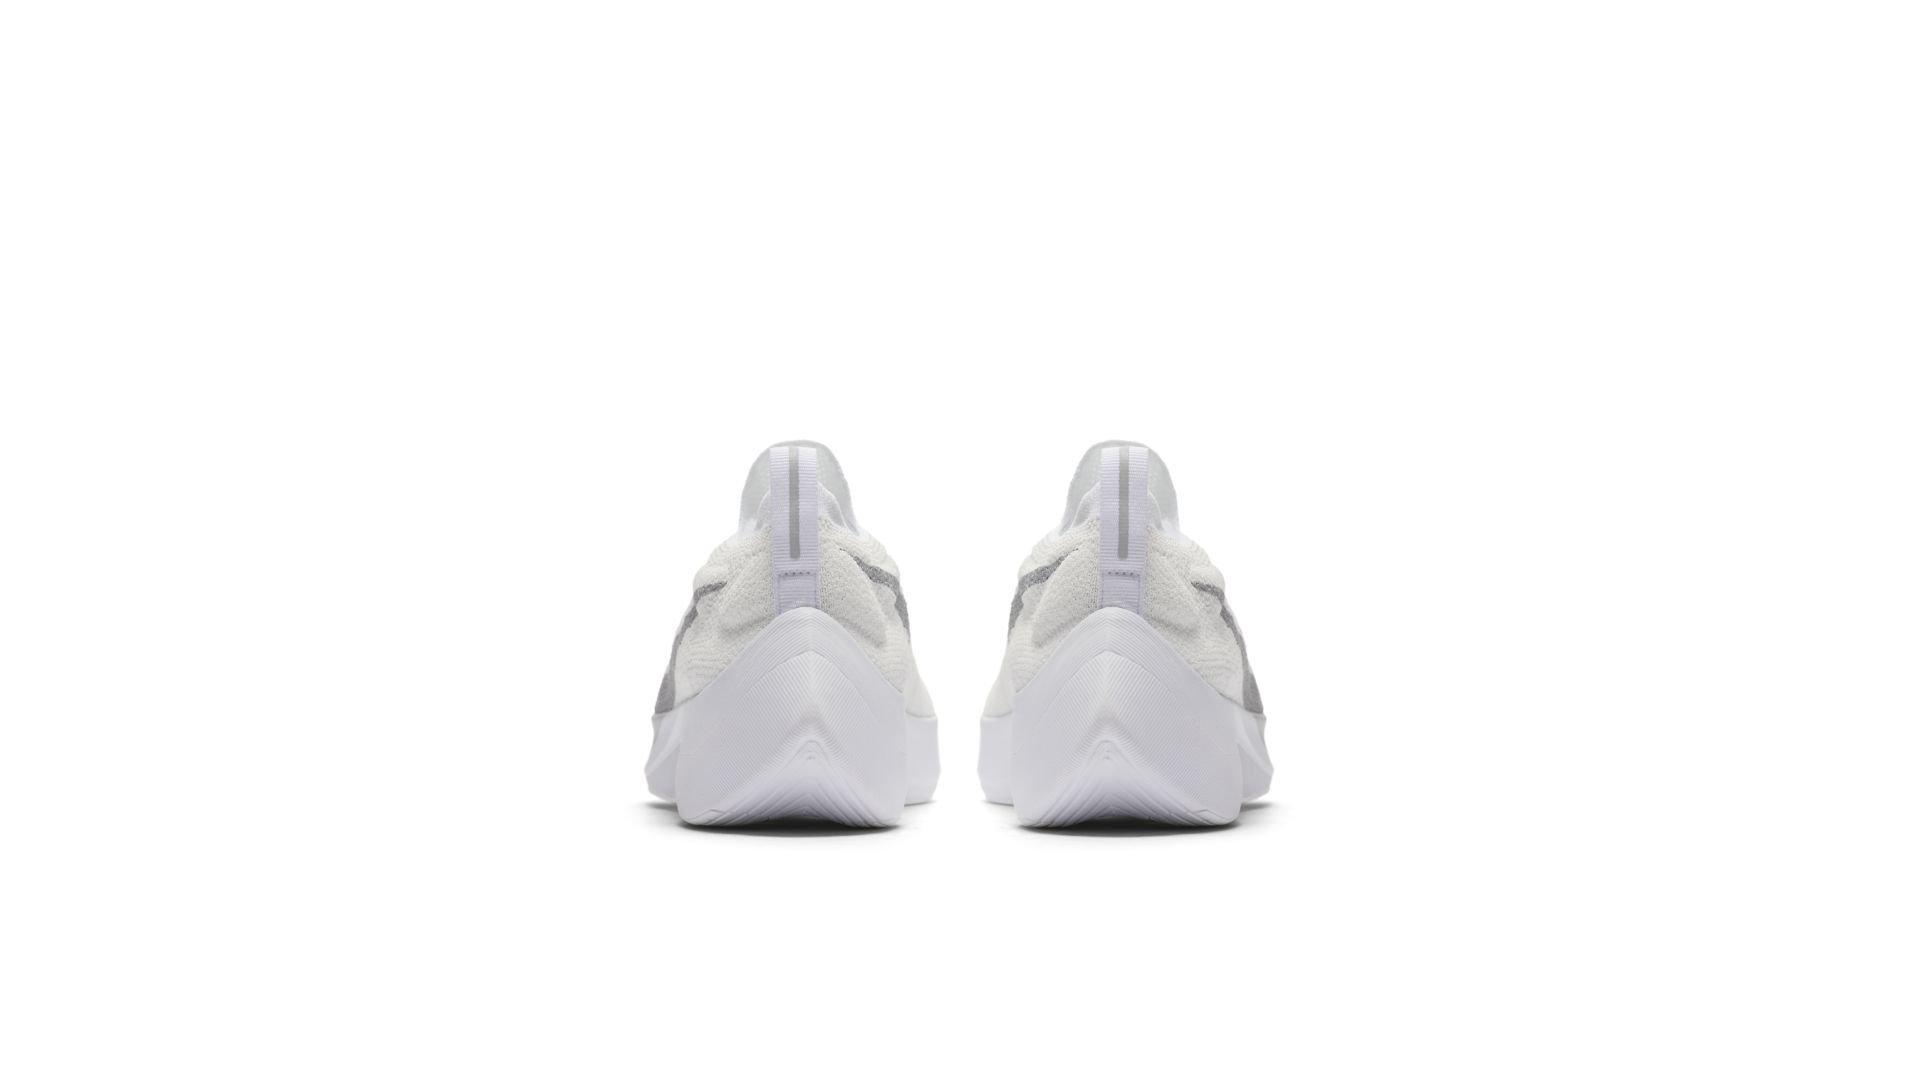 Nike Vapor Street Flyknit Pure White (AQ1763-100)